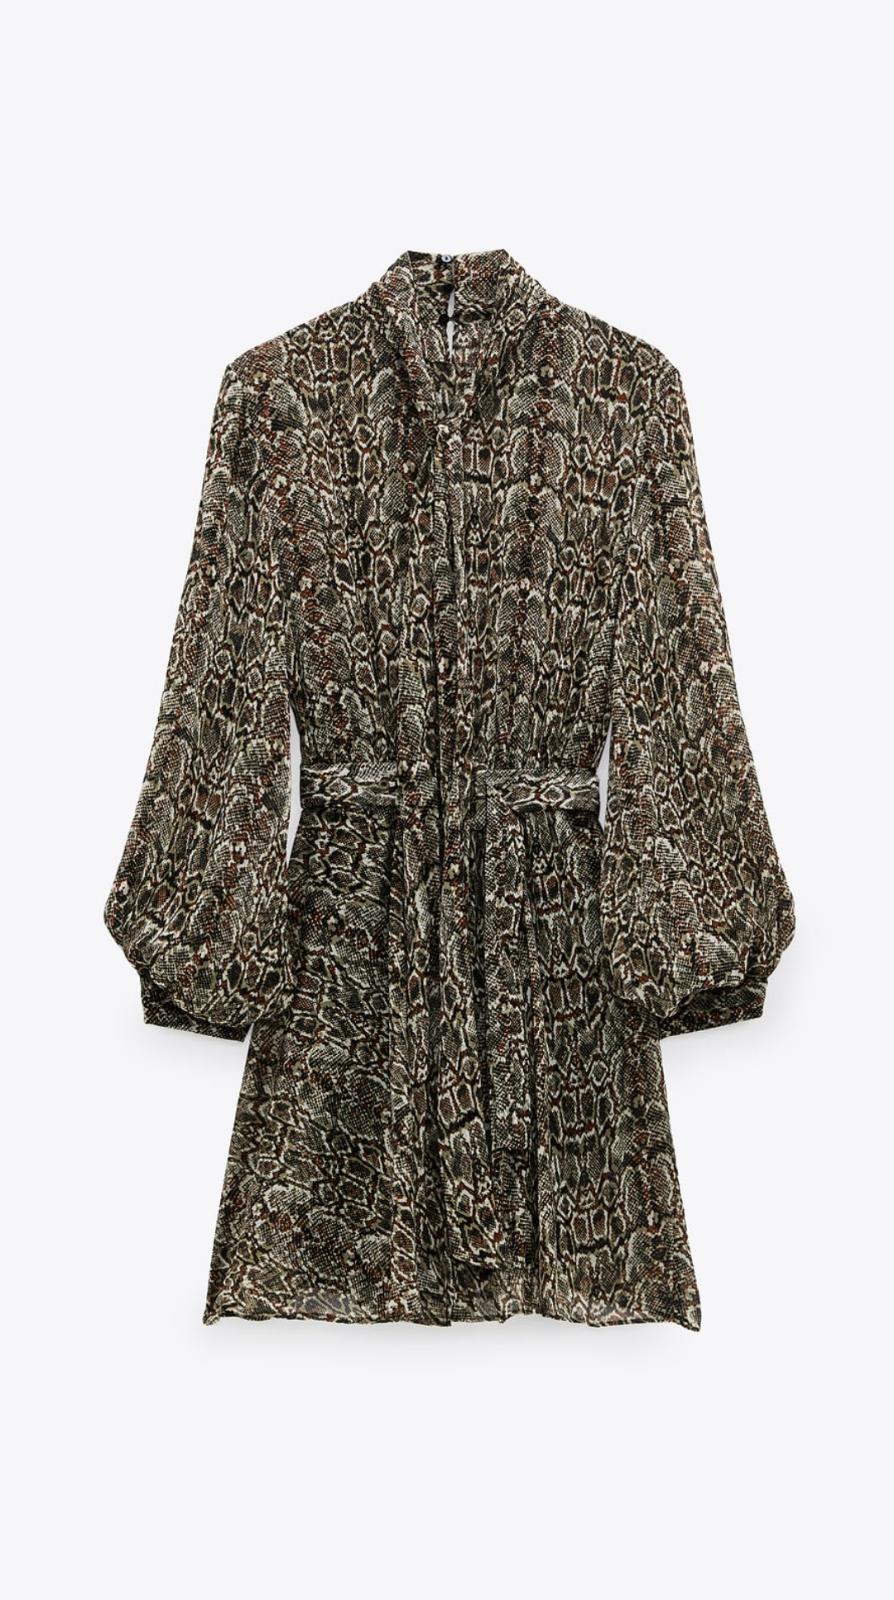 Vestido fluido con mangas abullonadas animal print de Zara